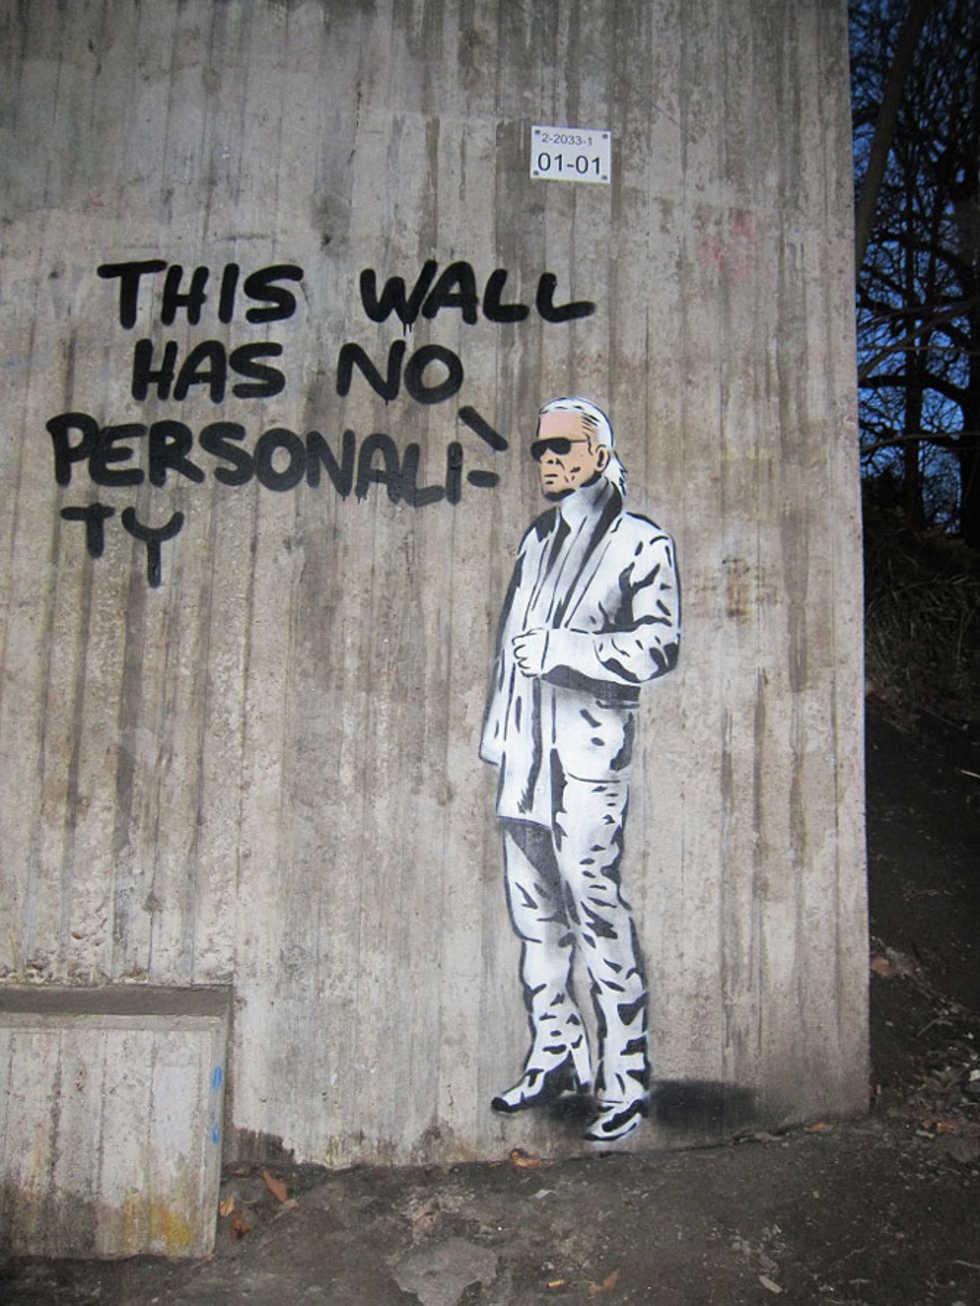 This wall has no personality